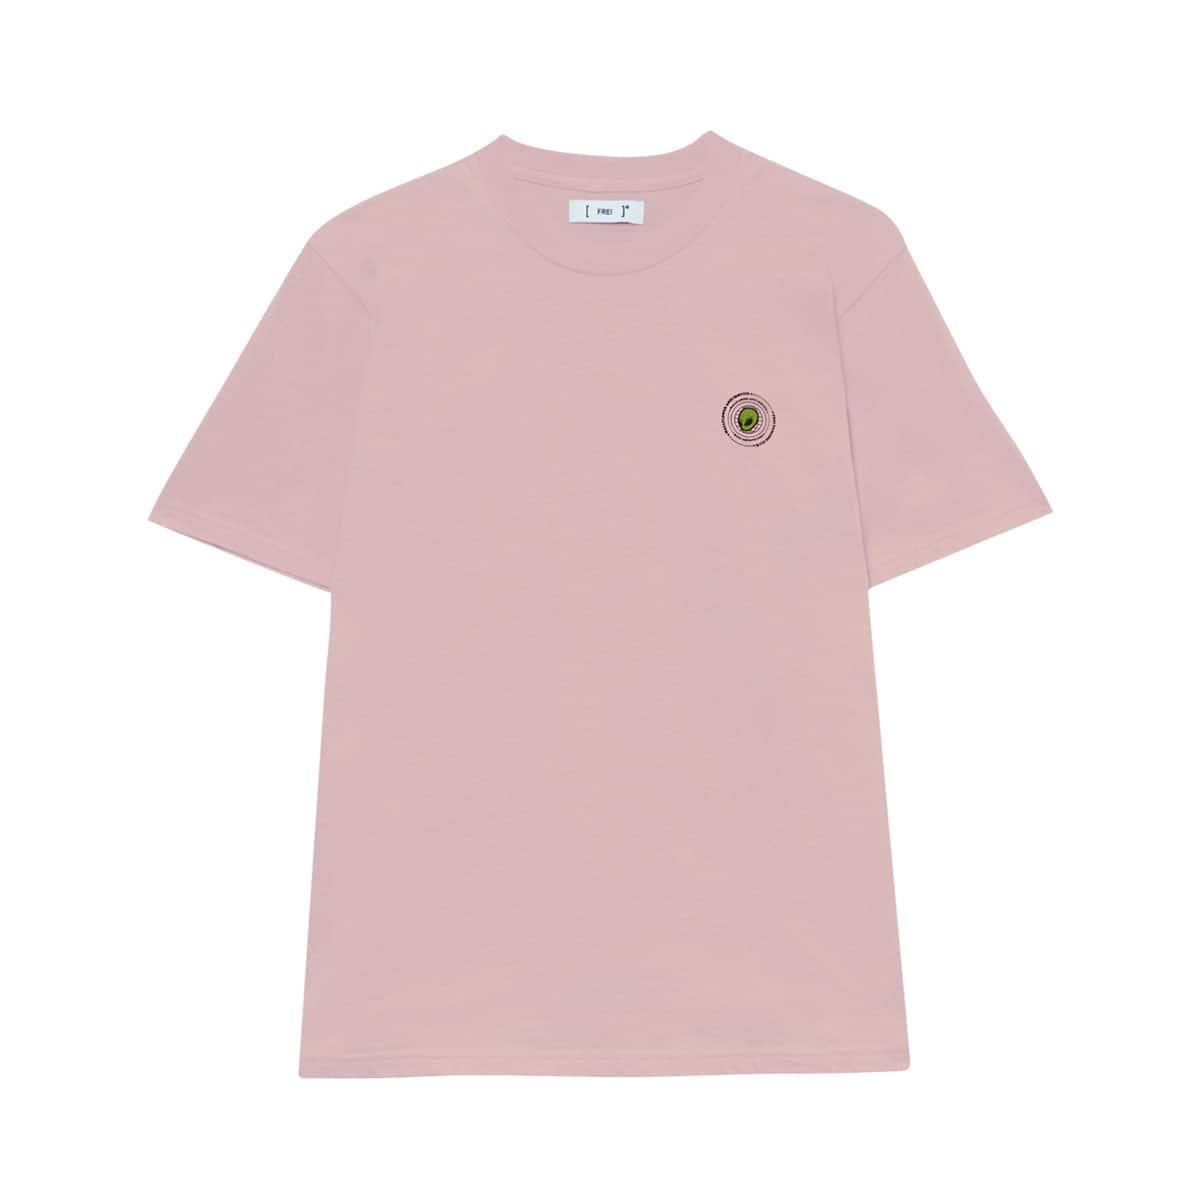 FREI X ATMOS C LOGO T-SHIRT Pink 20SU-I_photo_large